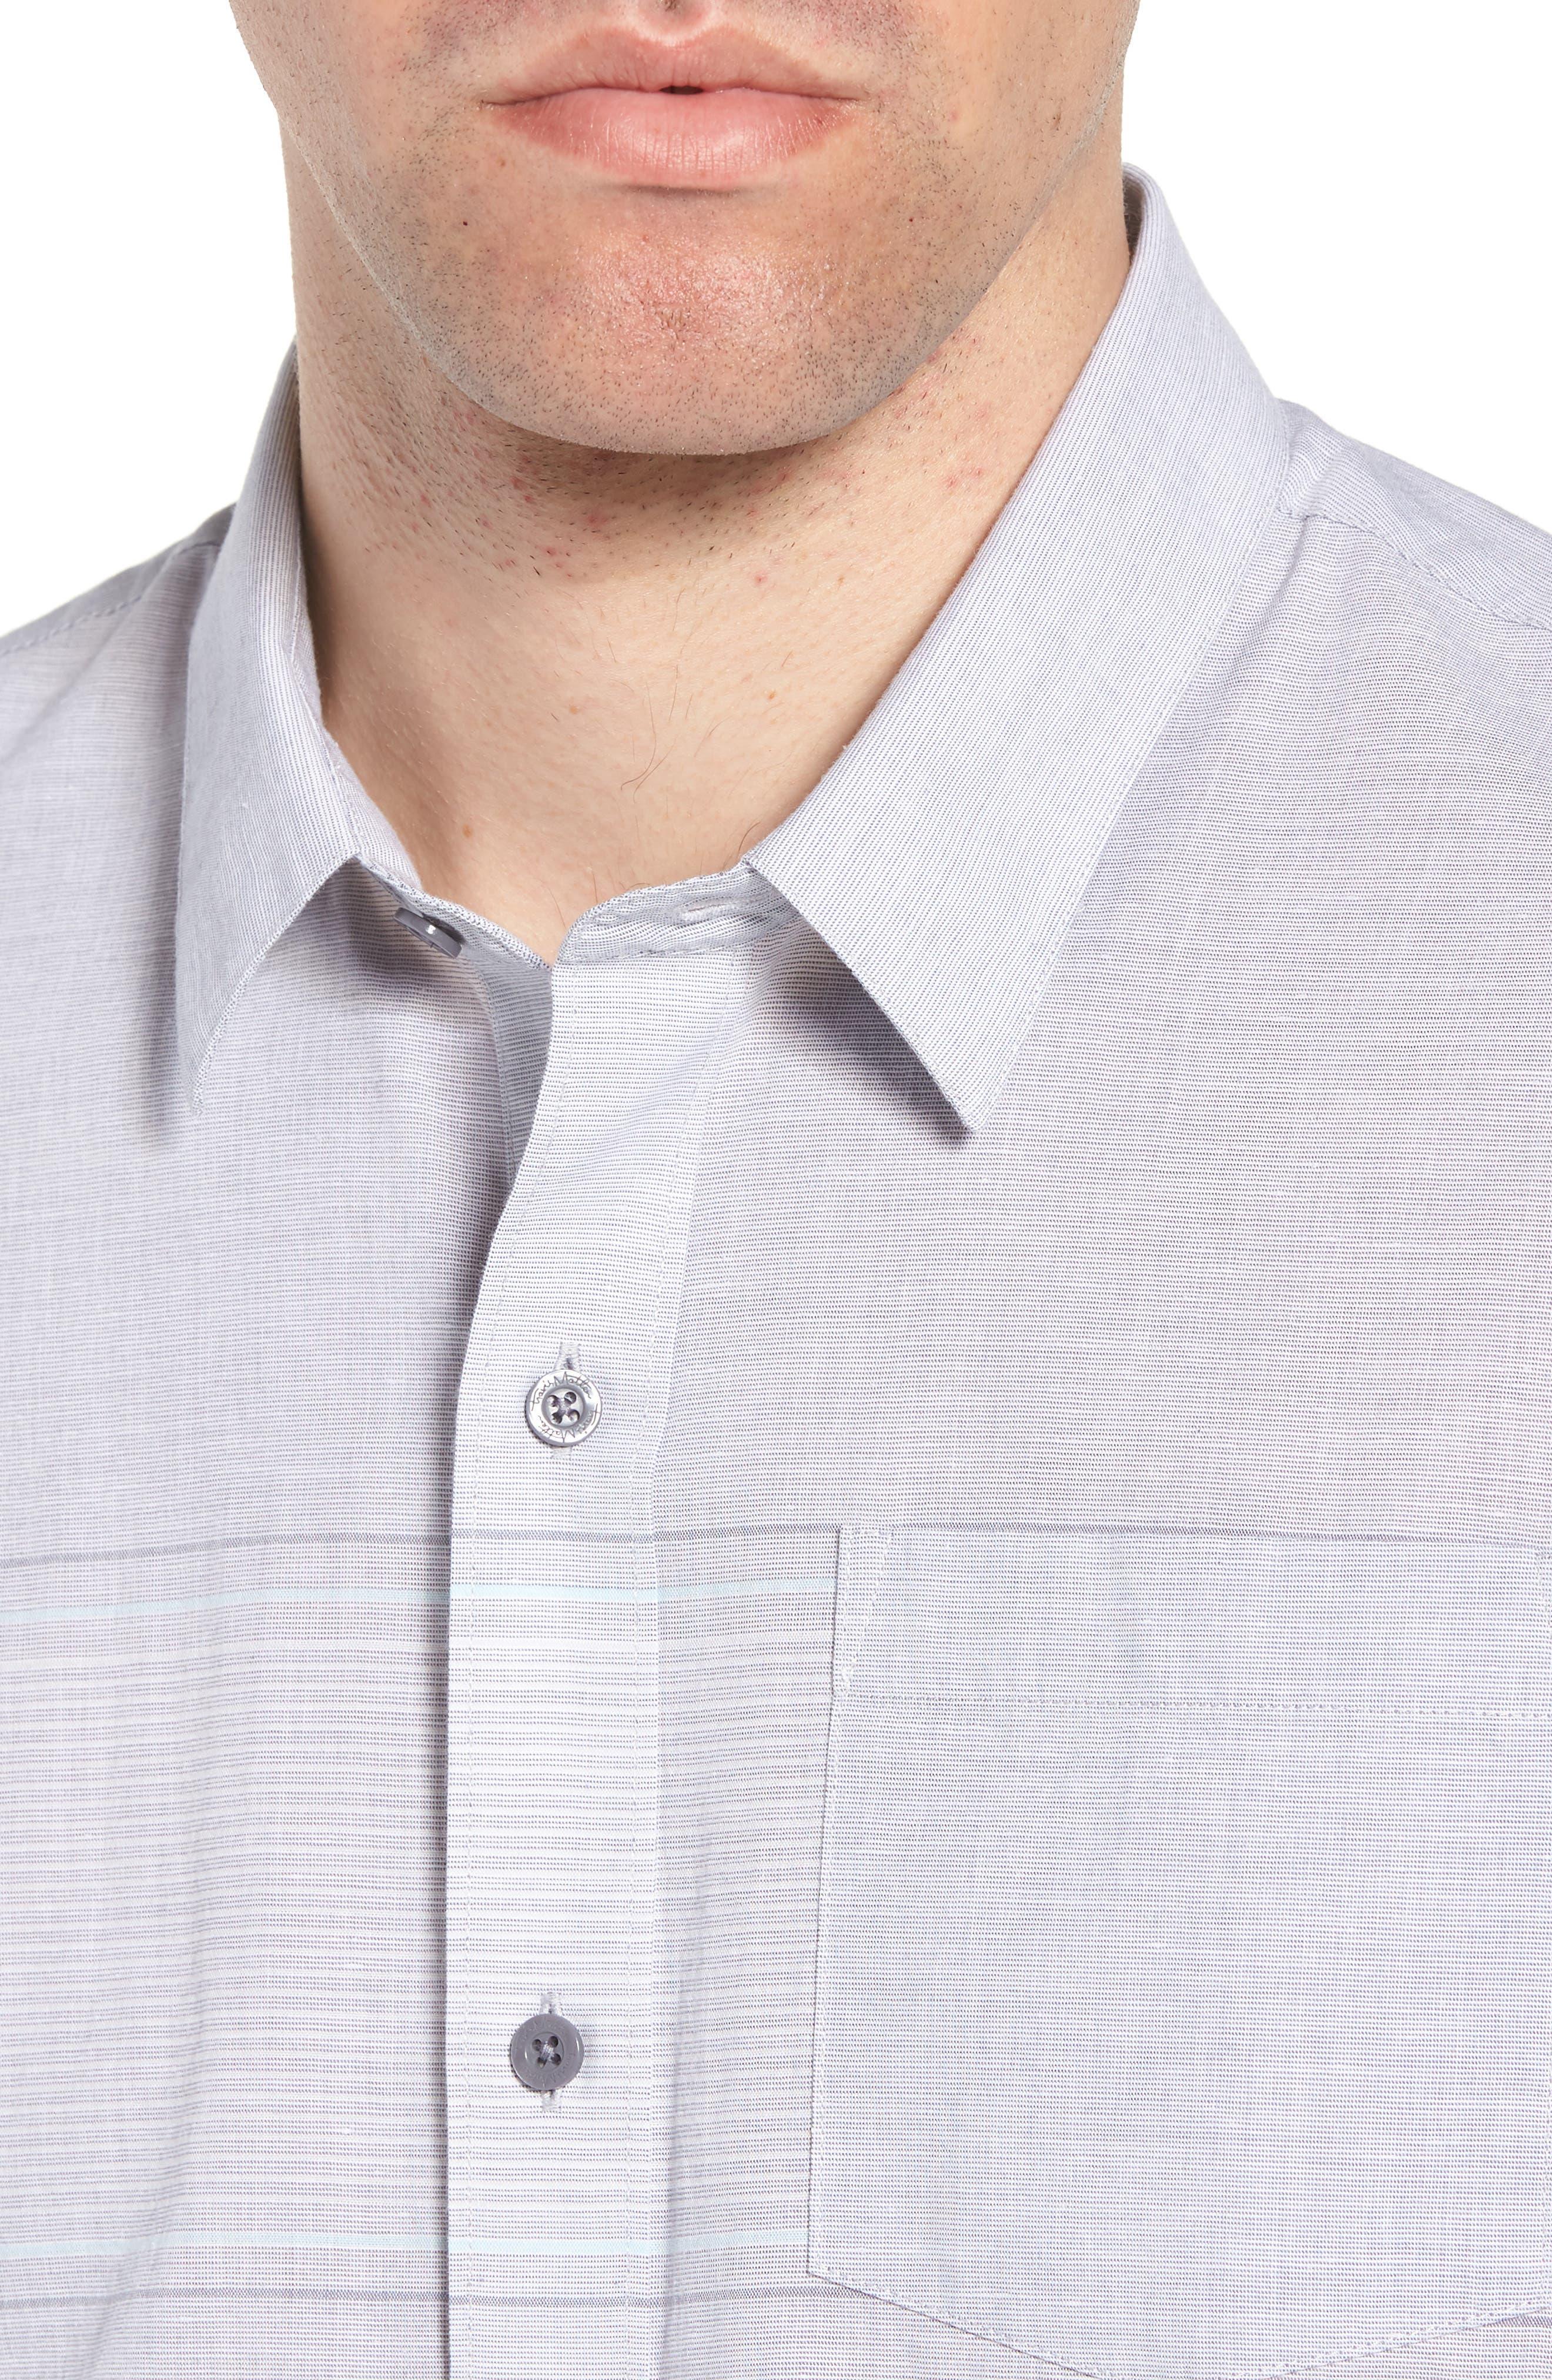 Oscar Regular Fit Sport Shirt,                             Alternate thumbnail 4, color,                             HEATHER GRASILLE